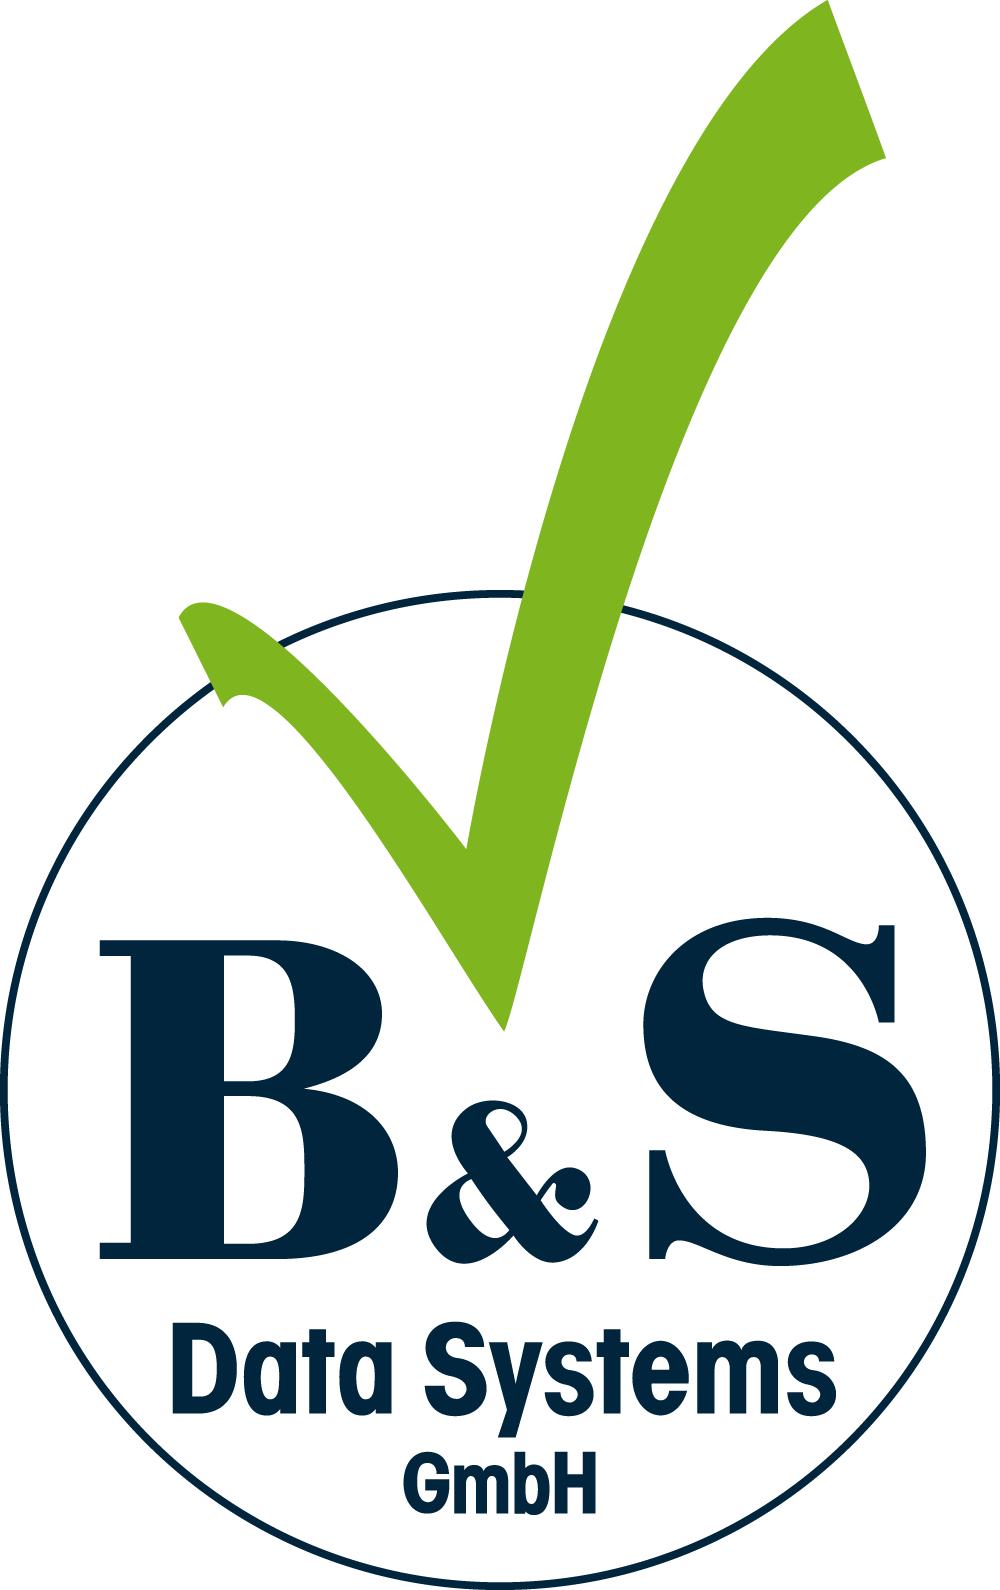 B & S Data Systems Logo